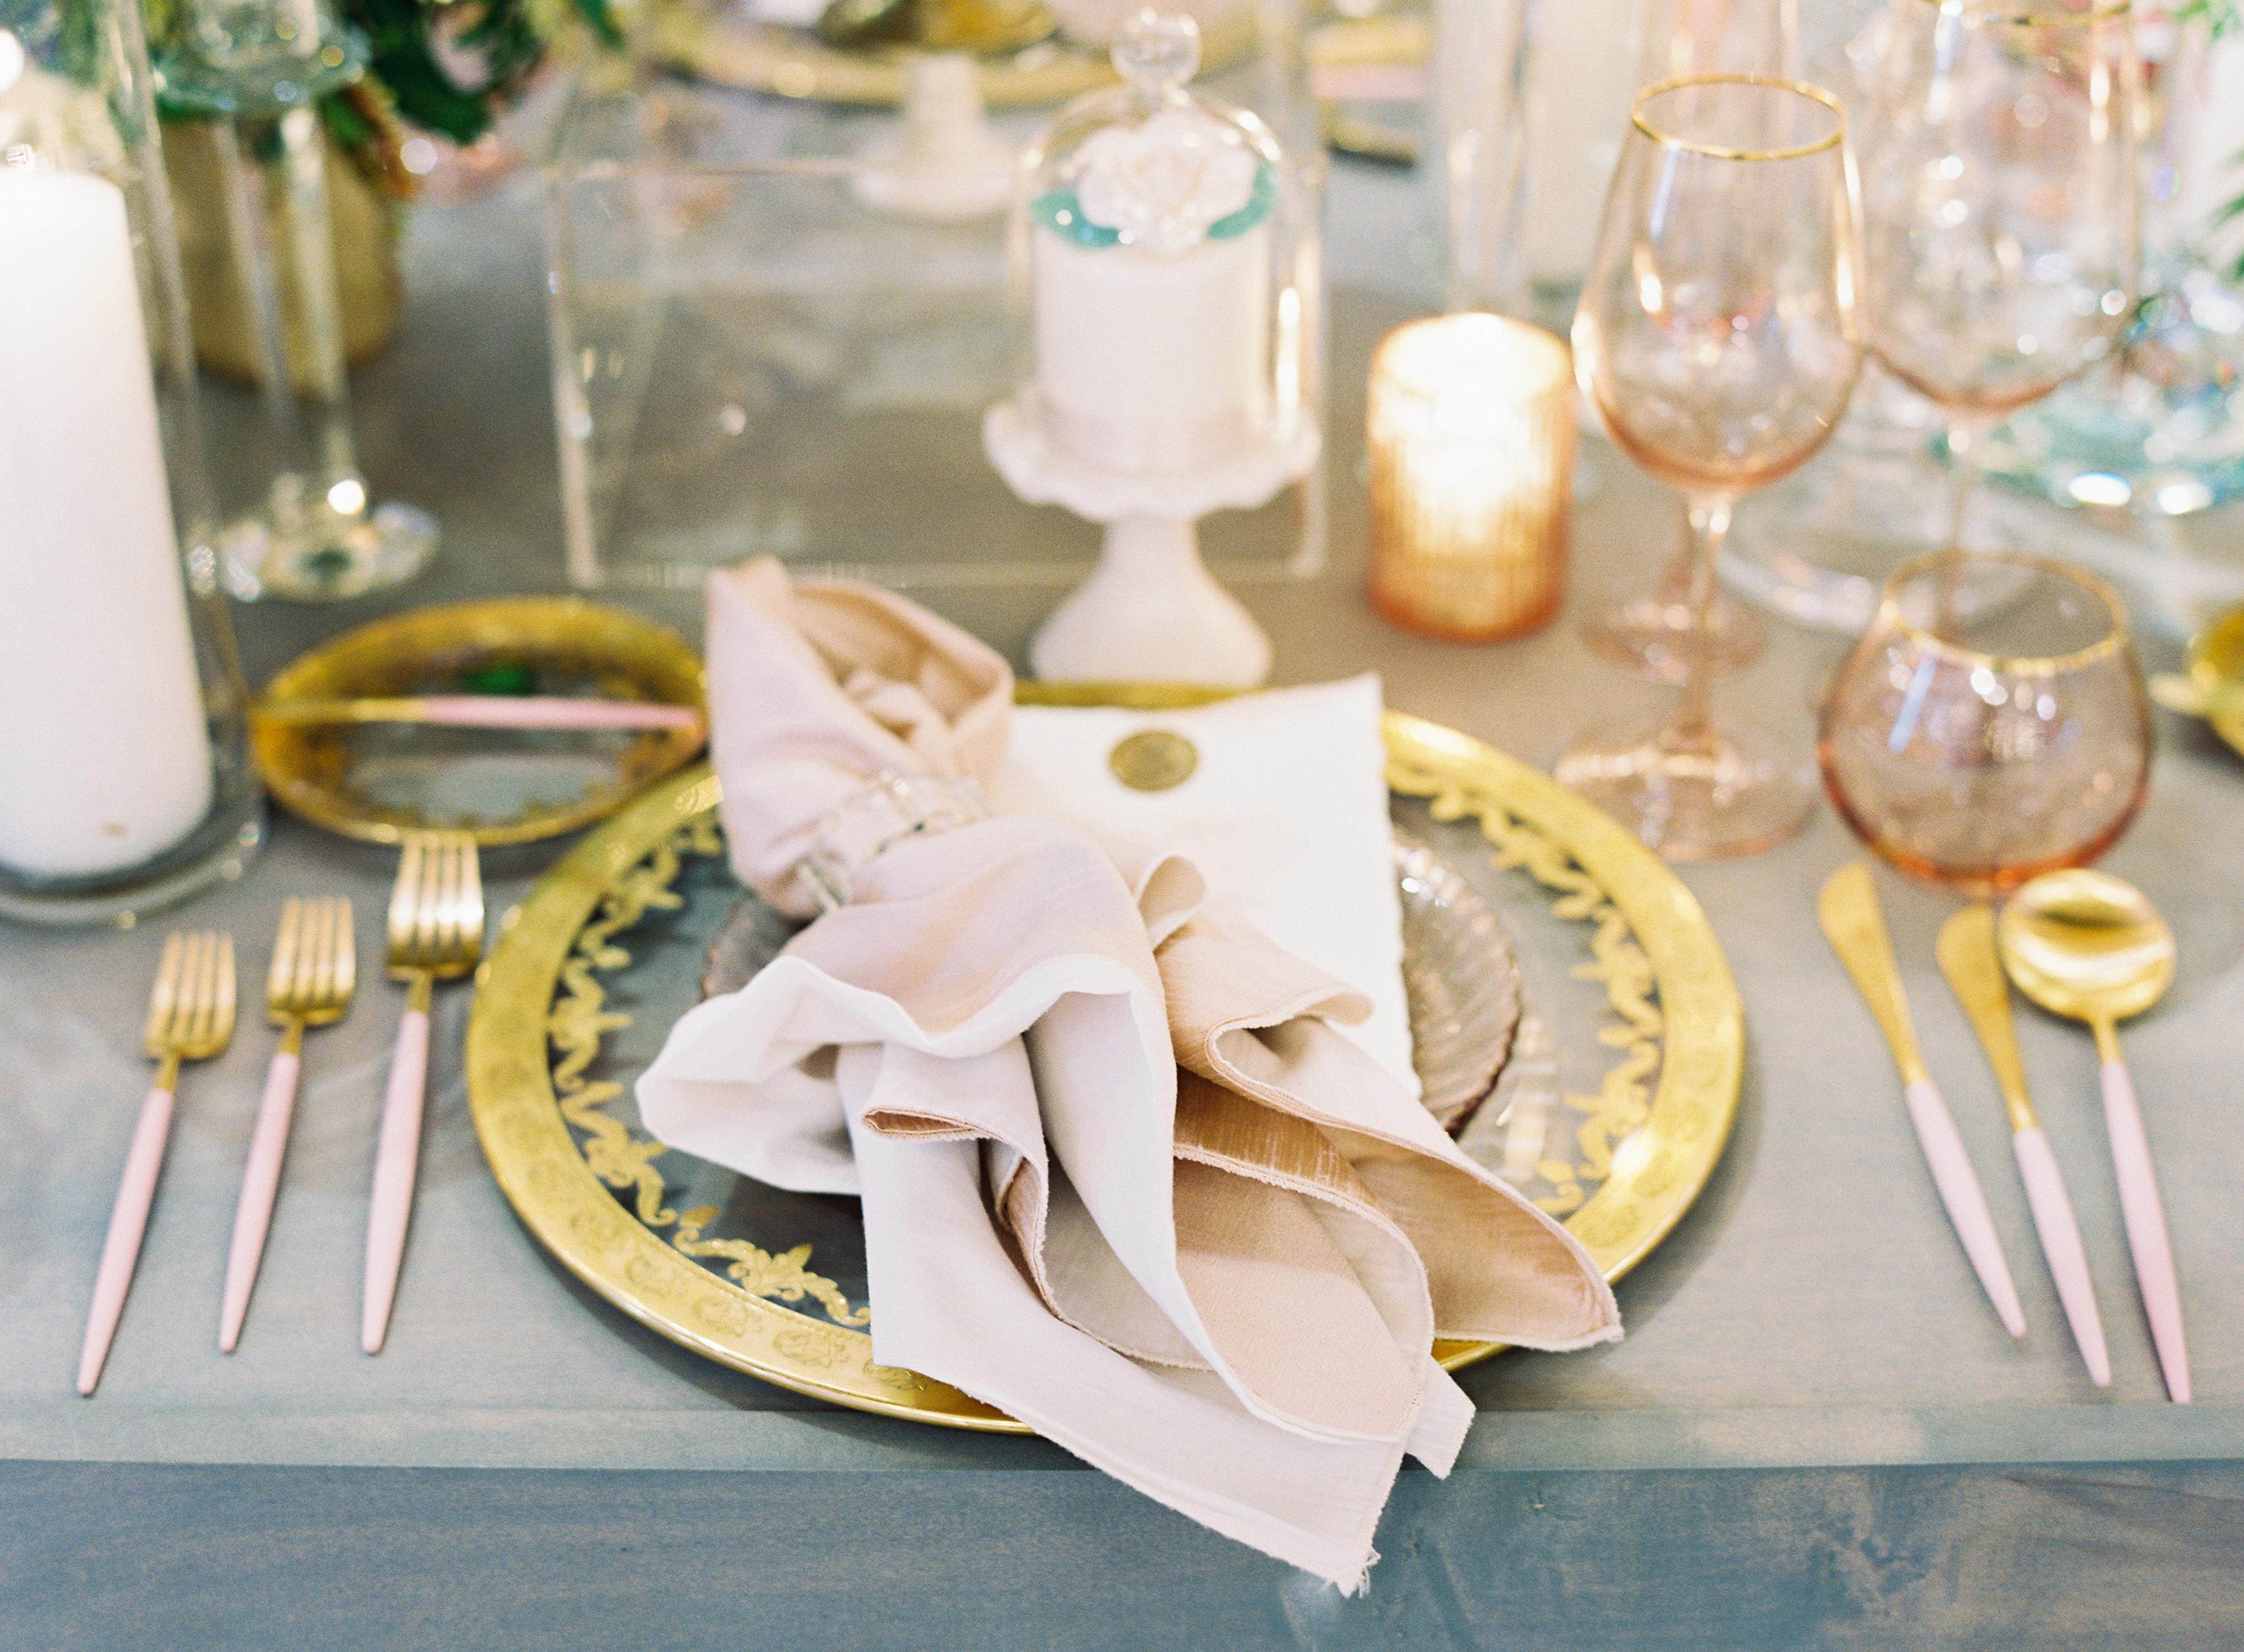 Athenaeum_Wedding_Hi_Res-82-Jen_Huang-005198-R1-006